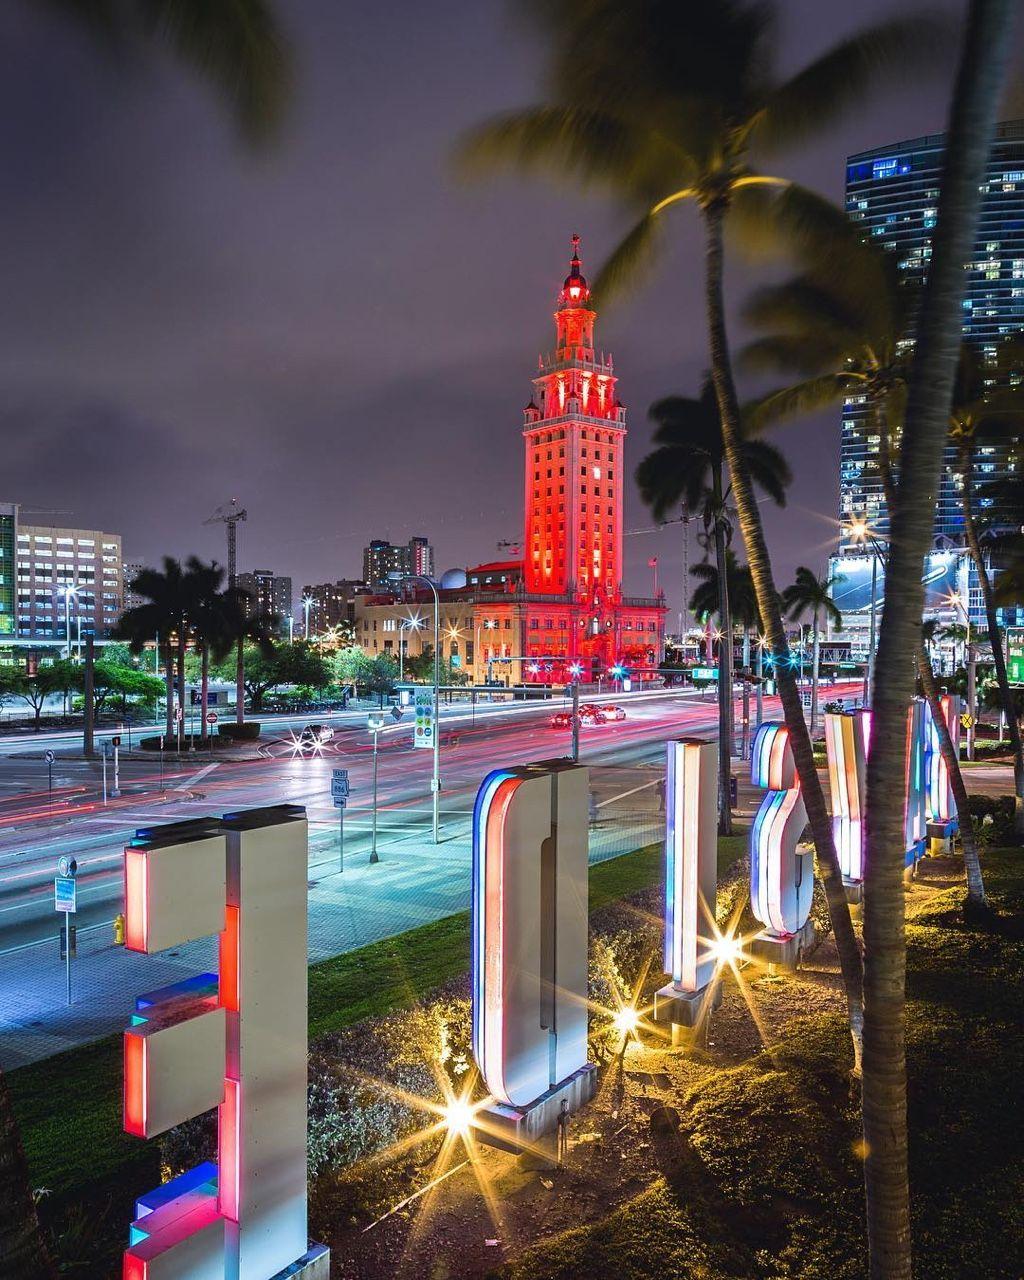 Bayside Miami Florida Miamibeach Sobe Southbeach Brickell Lovefl By Oasisjae